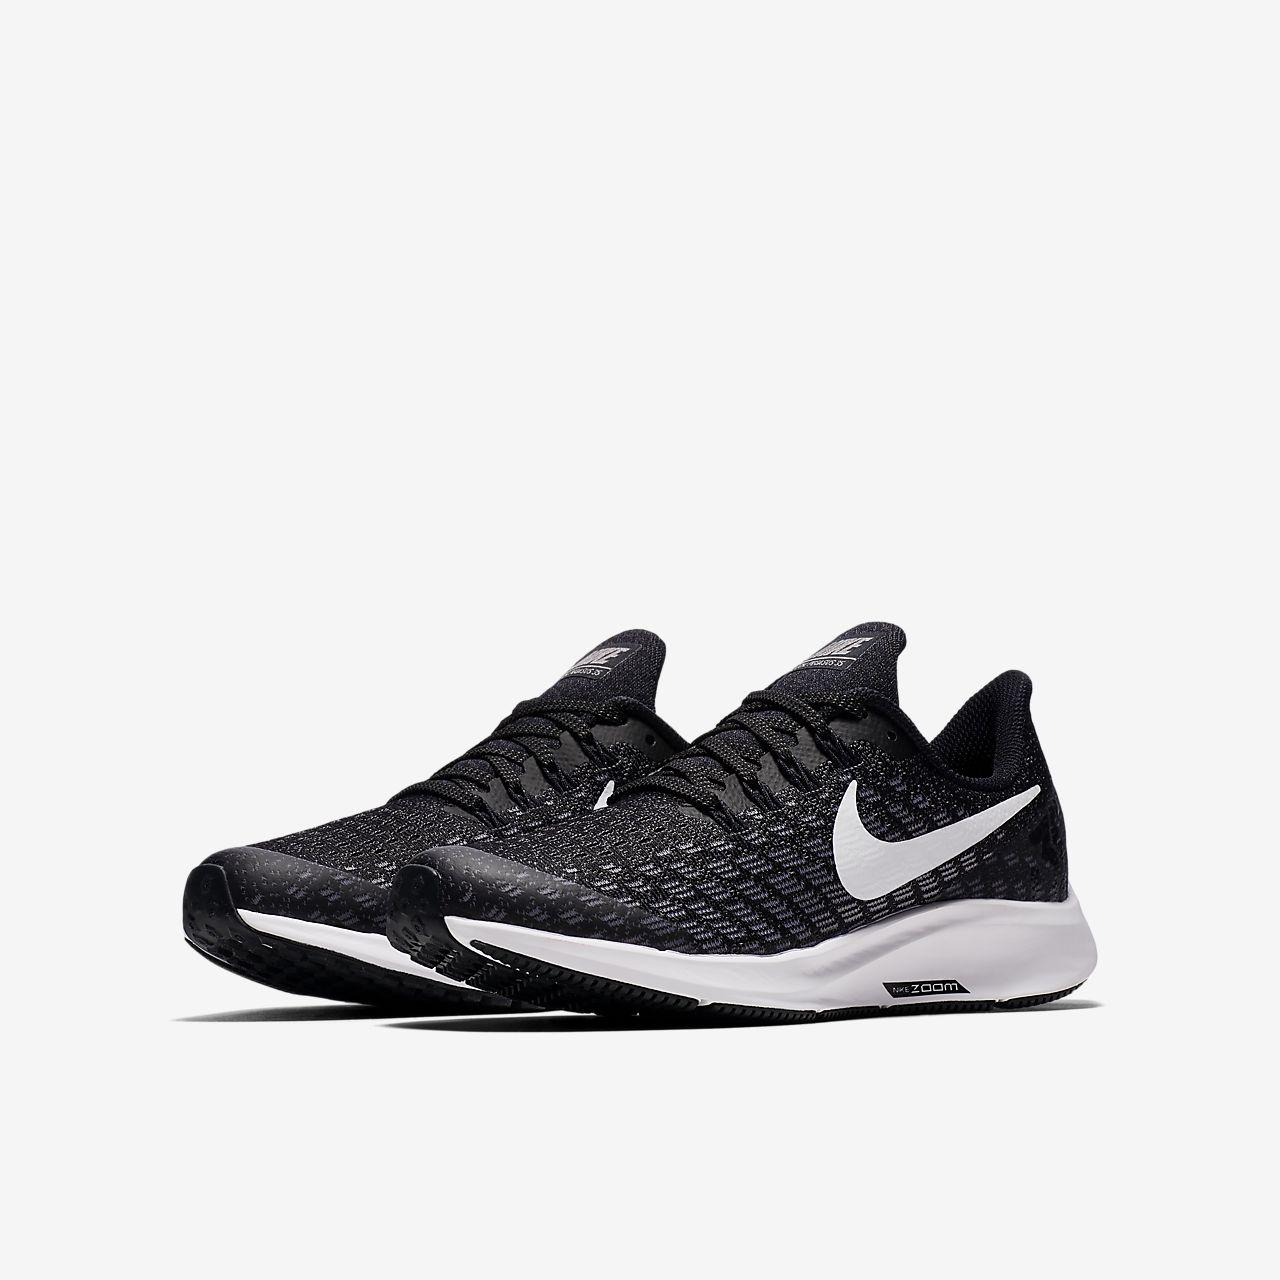 online store 5a34f 82889 ... Löparsko Nike Air Zoom Pegasus 35 för barn ungdom